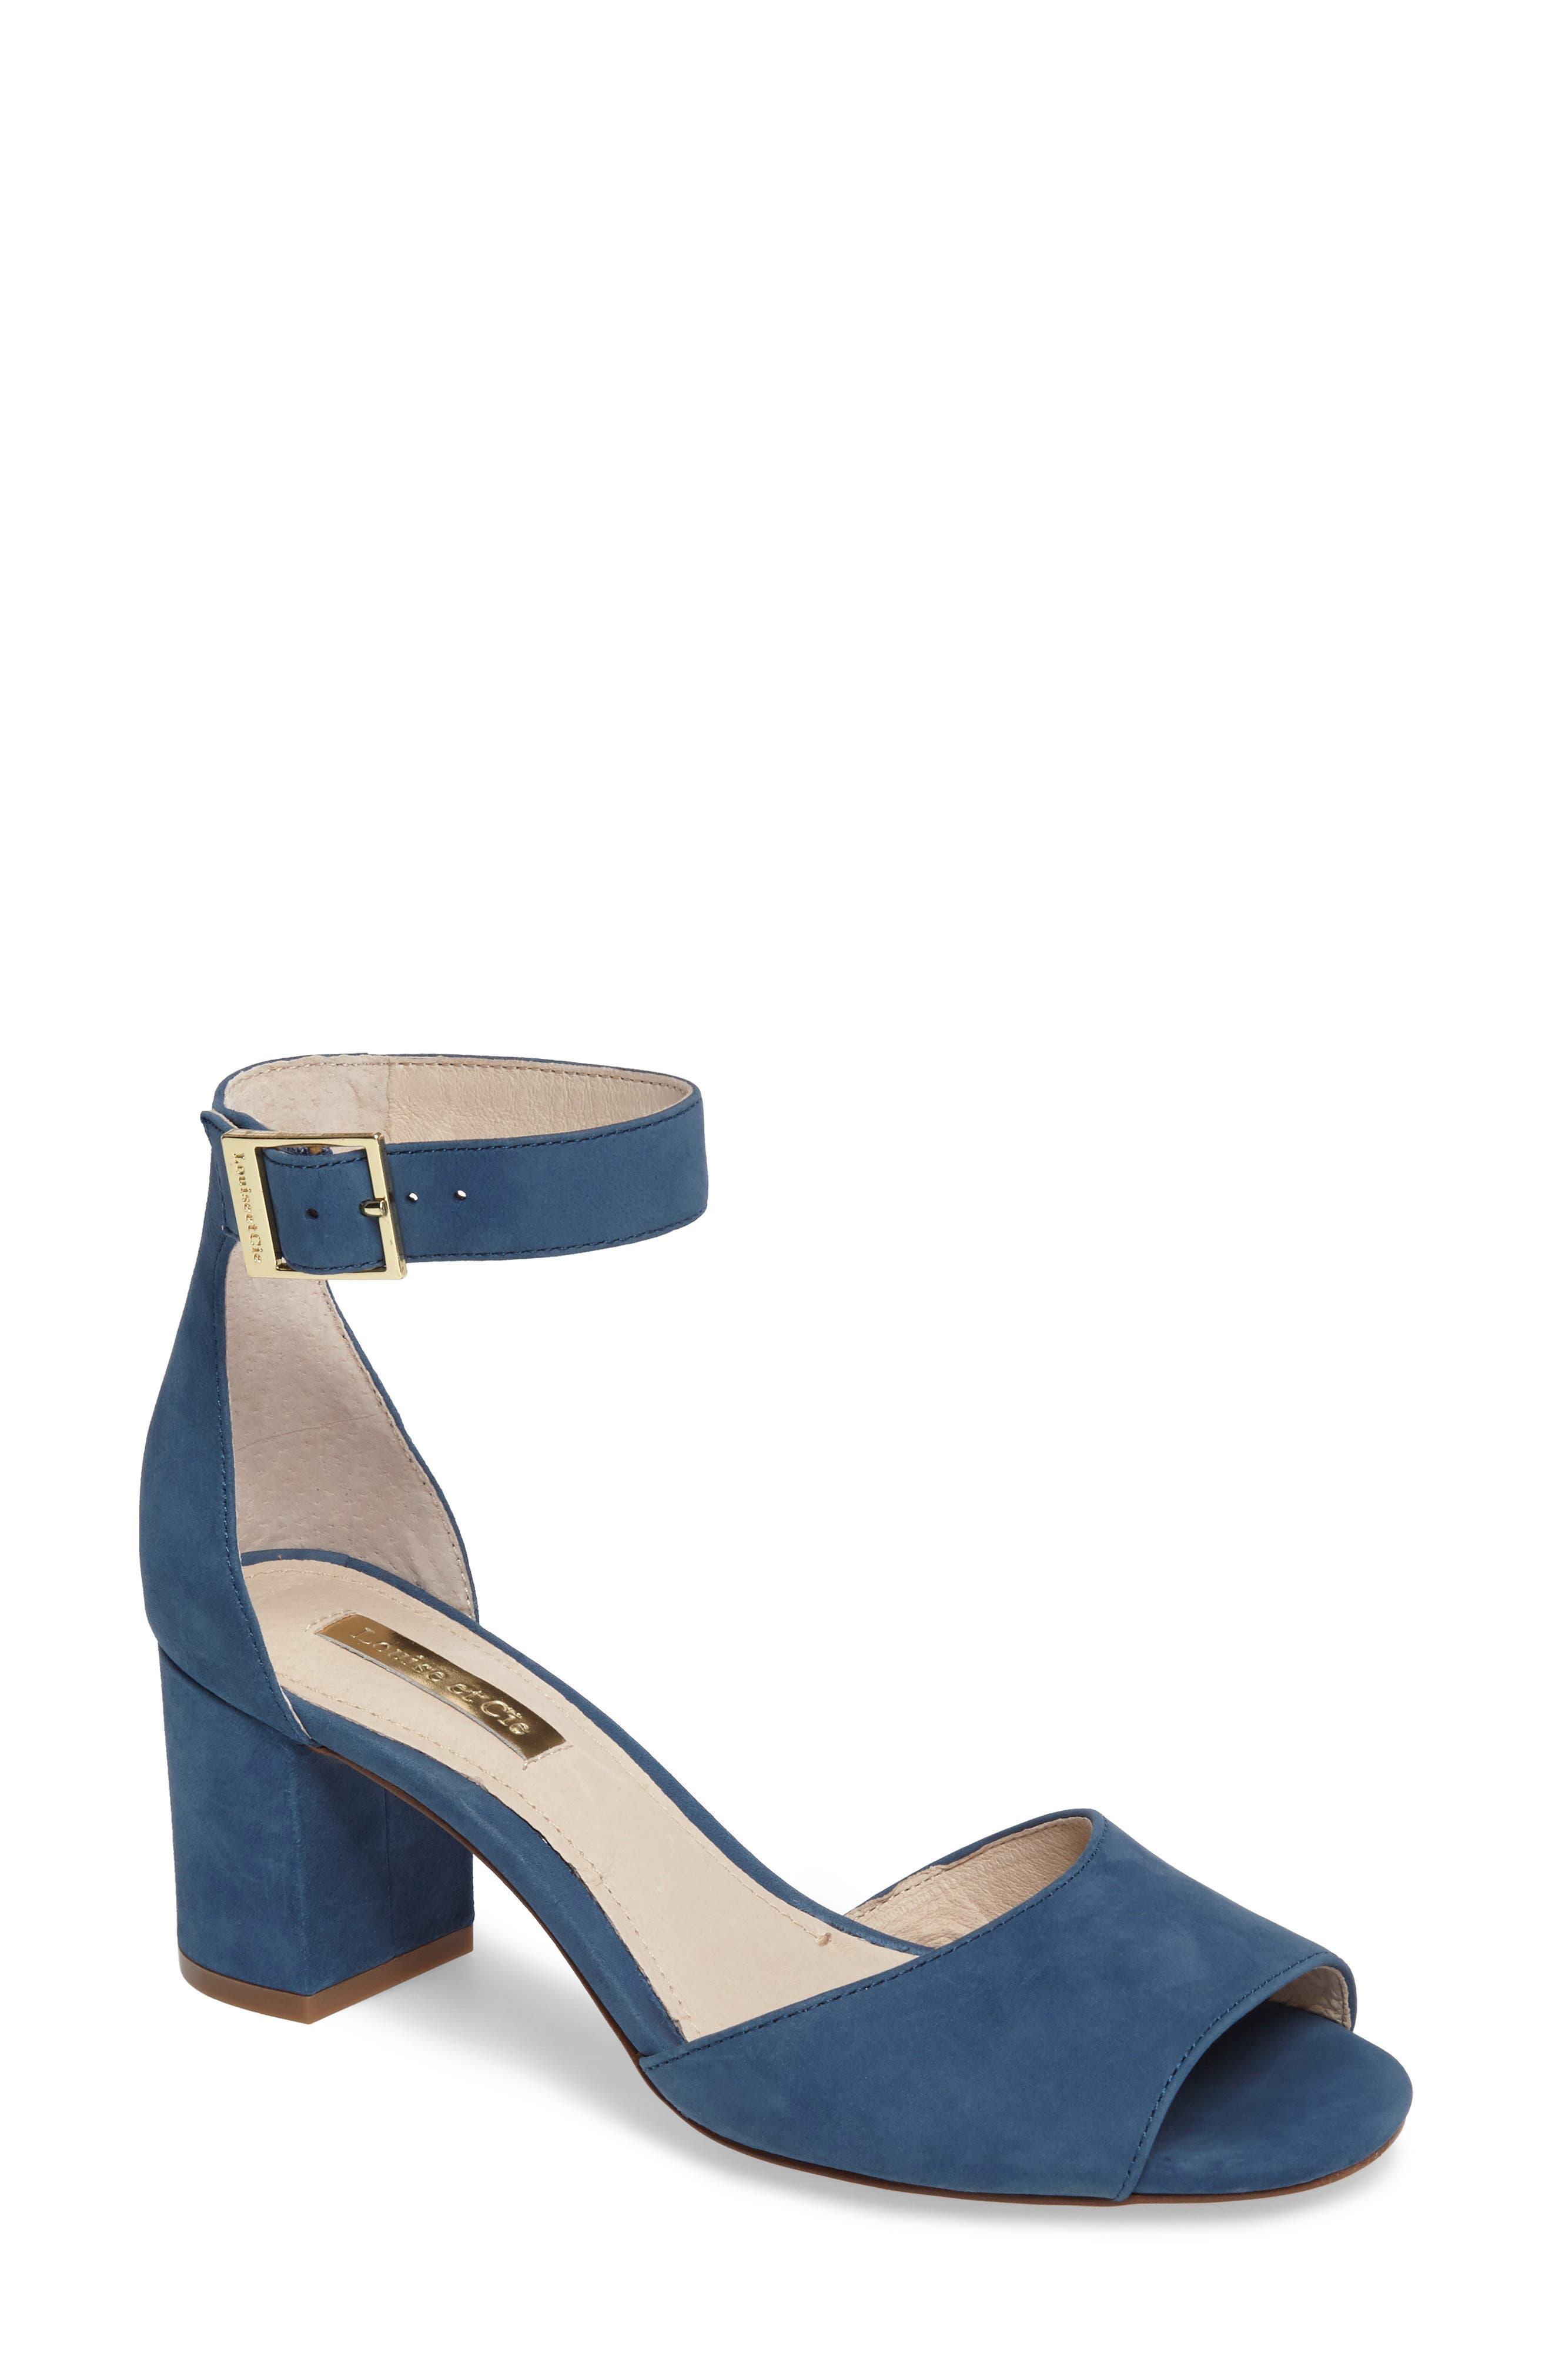 Karisa Ankle Cuff Sandal,                         Main,                         color, 401